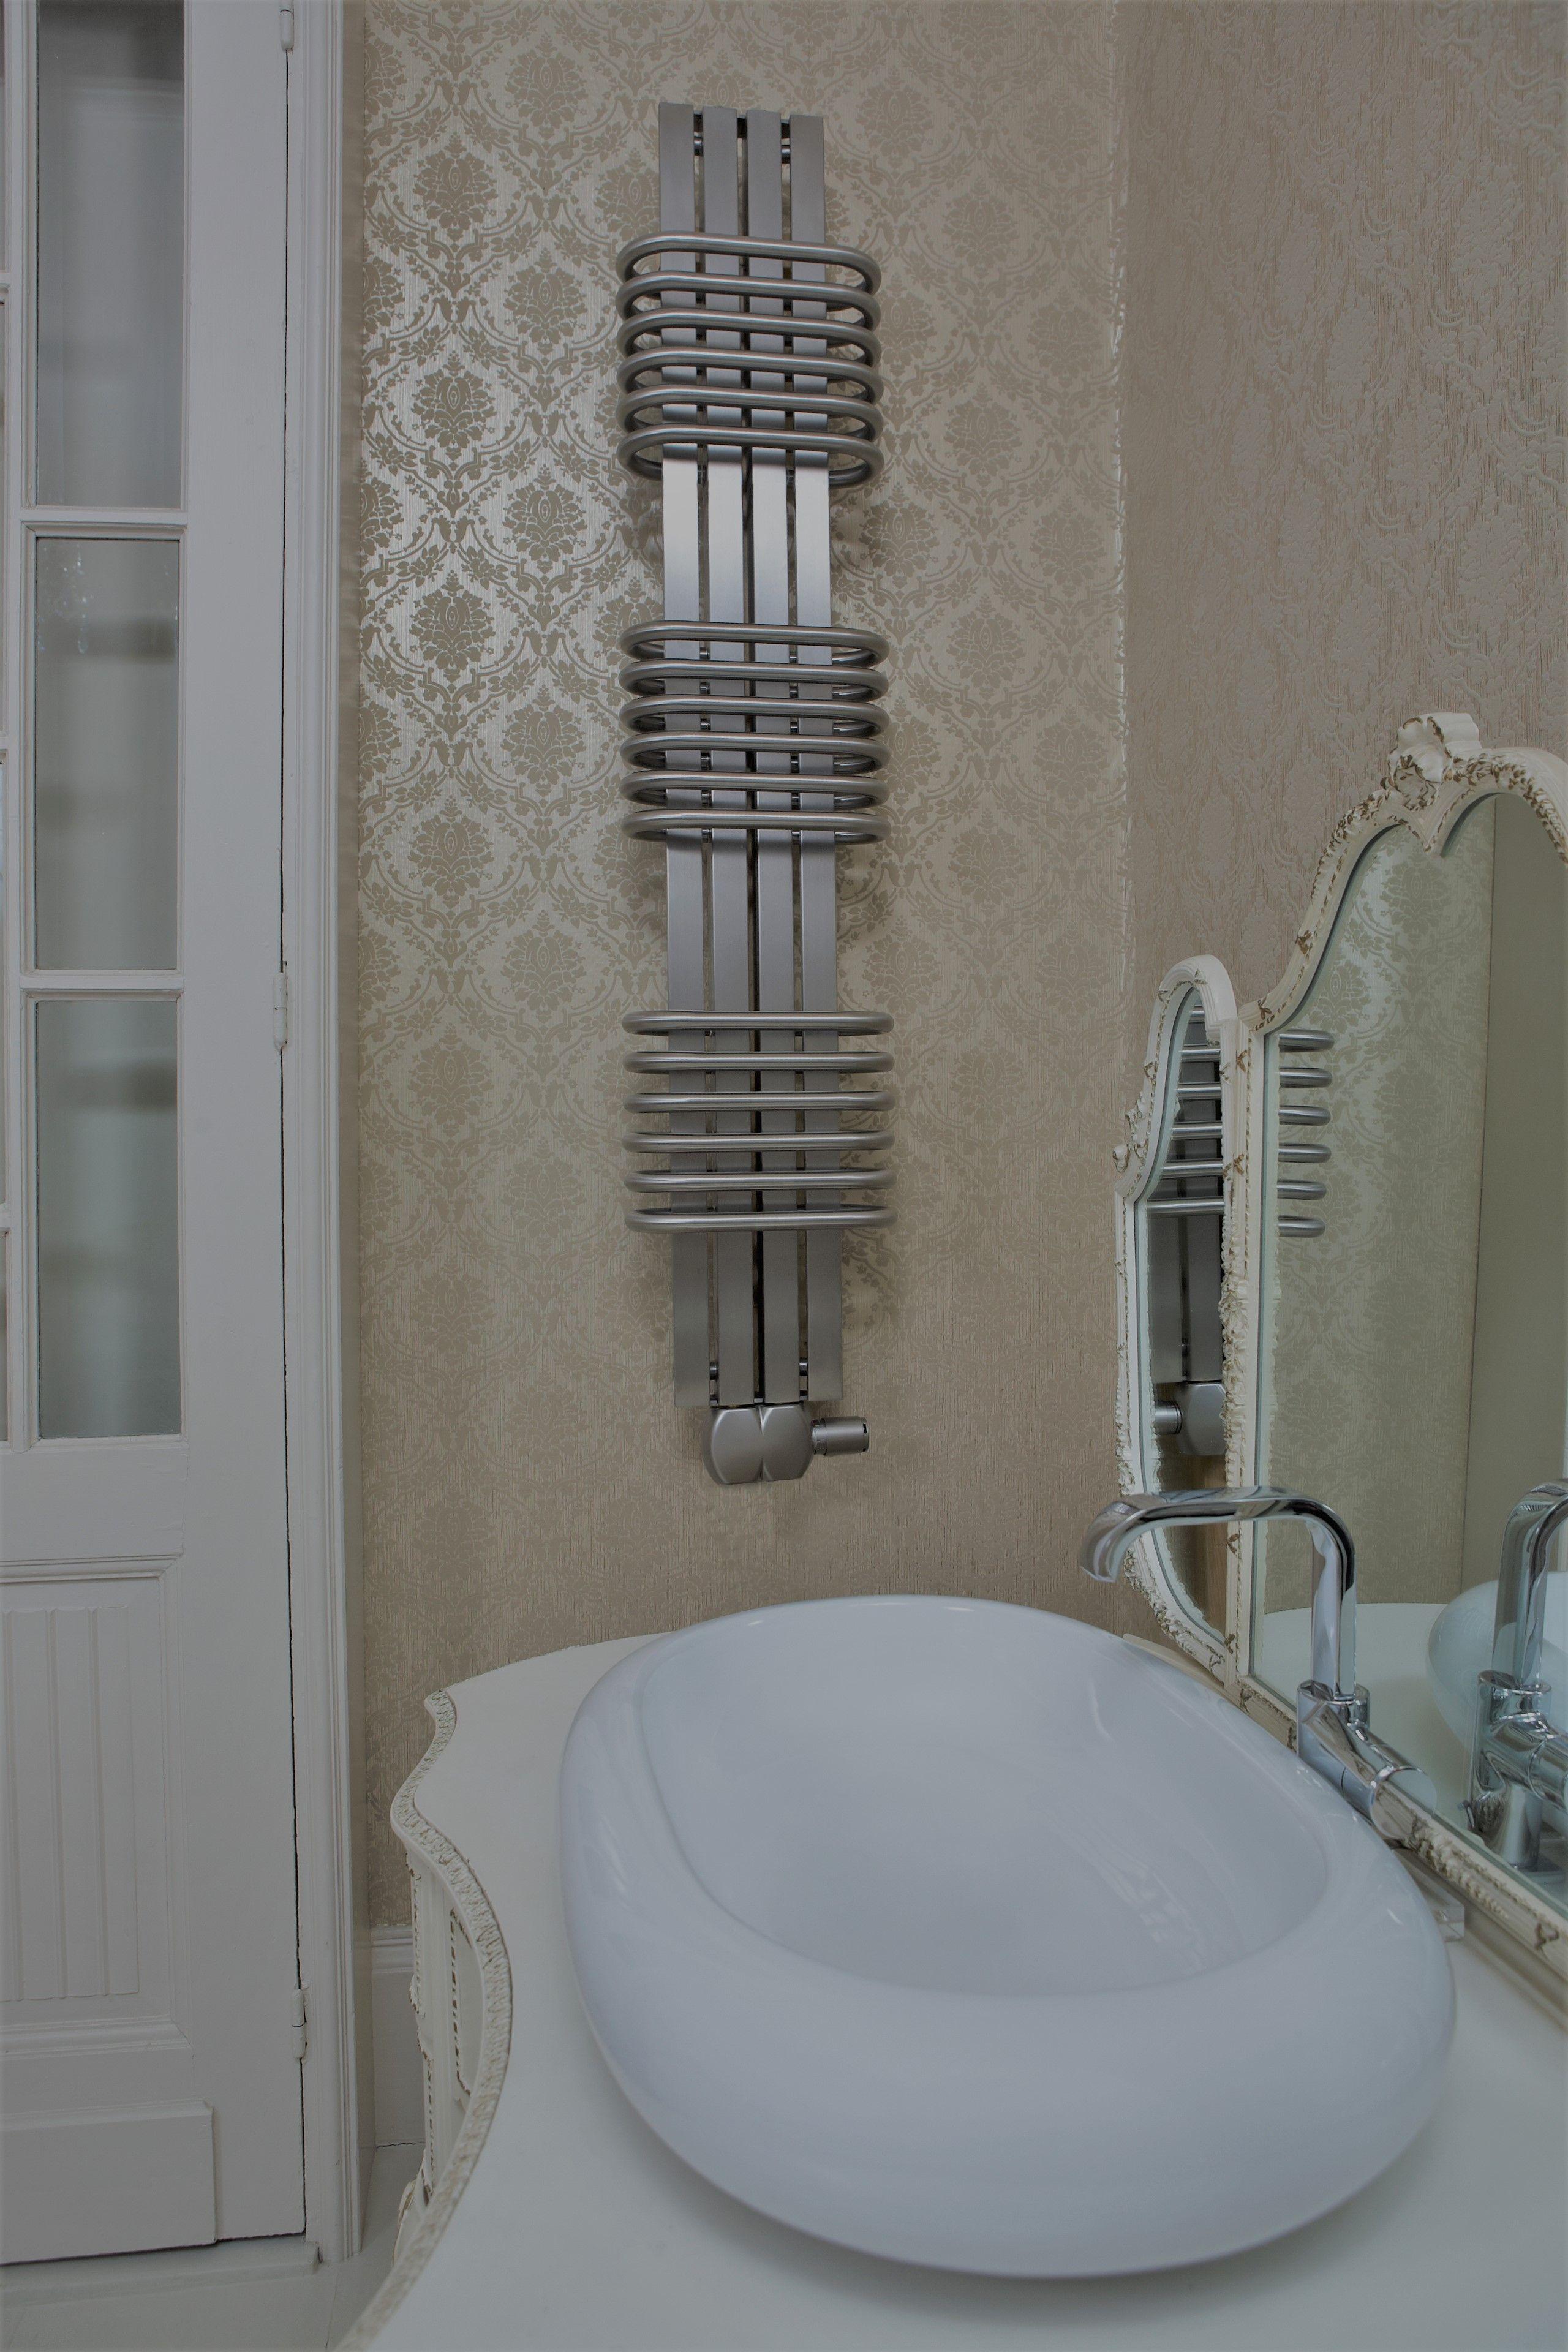 Bolero RVS design radiator badkamer 630x300 mat geborsteld ...